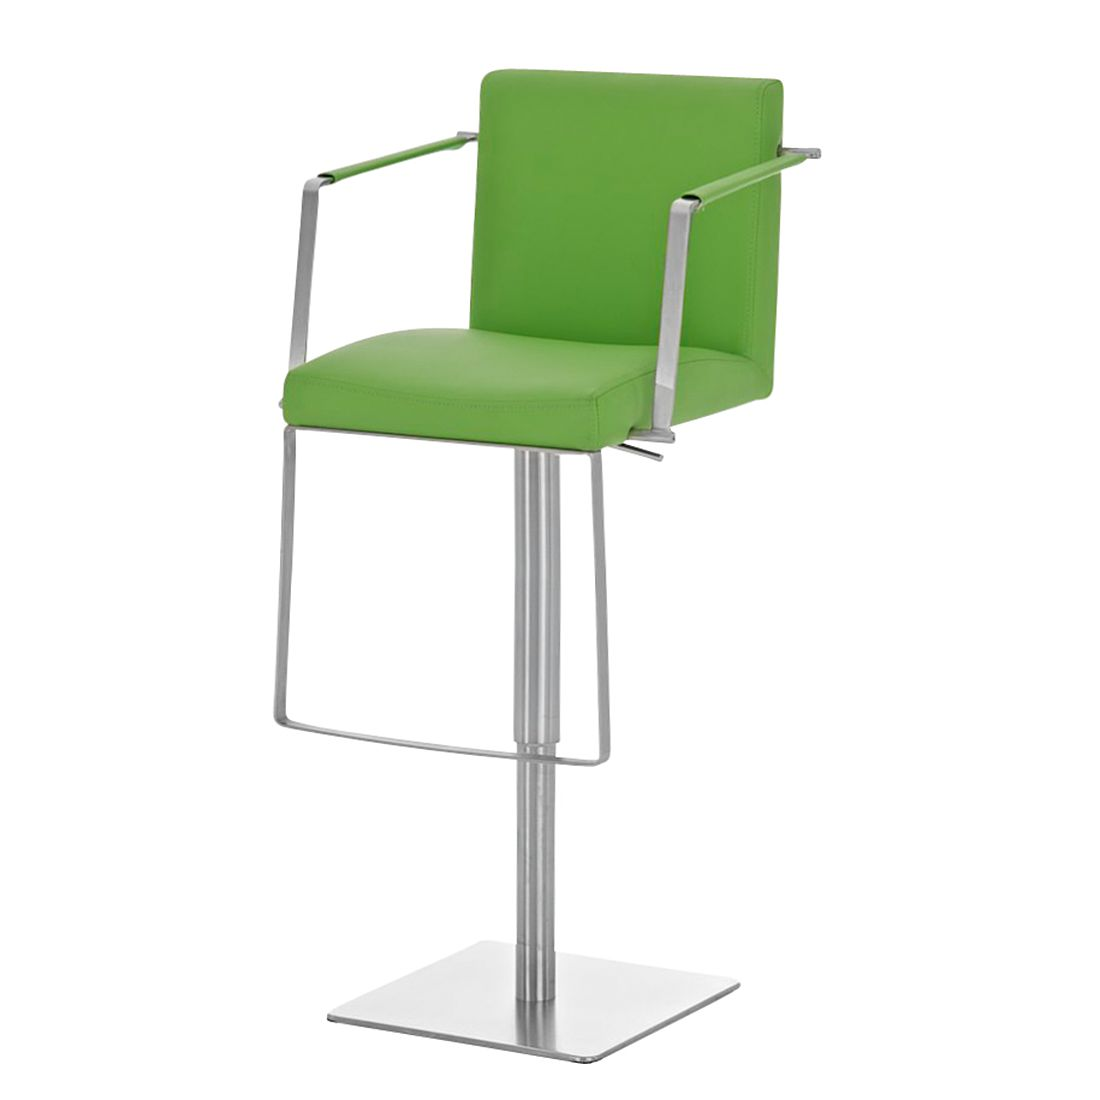 Barhocker Santiago – Grün -Edelstahl/Kunstleder, CLP günstig bestellen